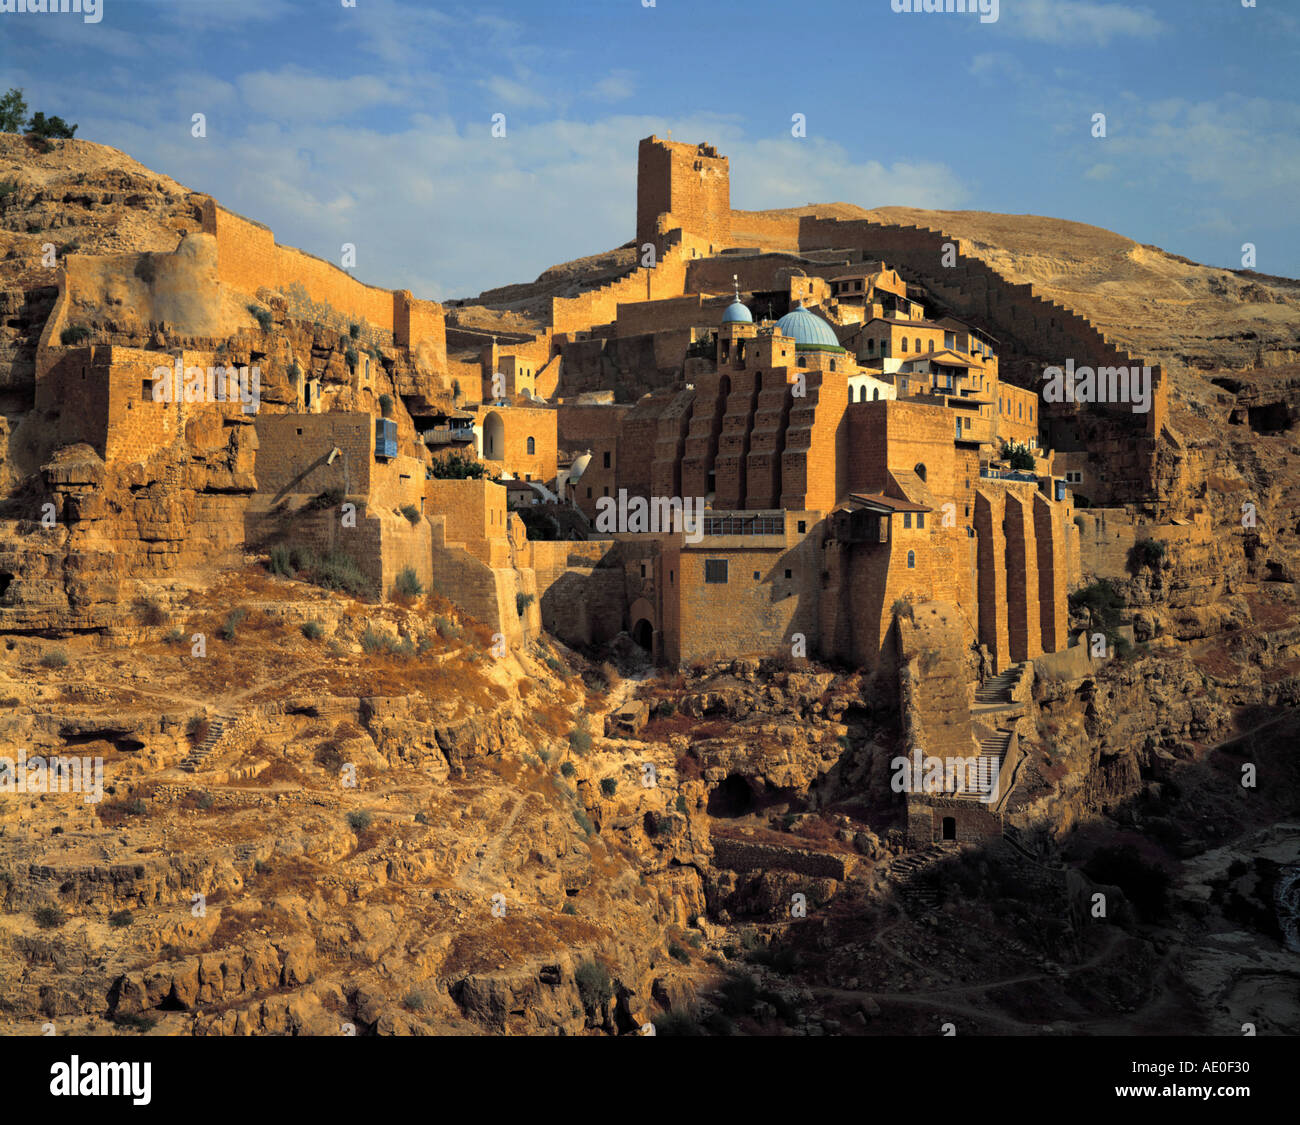 monastery mar saba judean desert israel - Stock Image